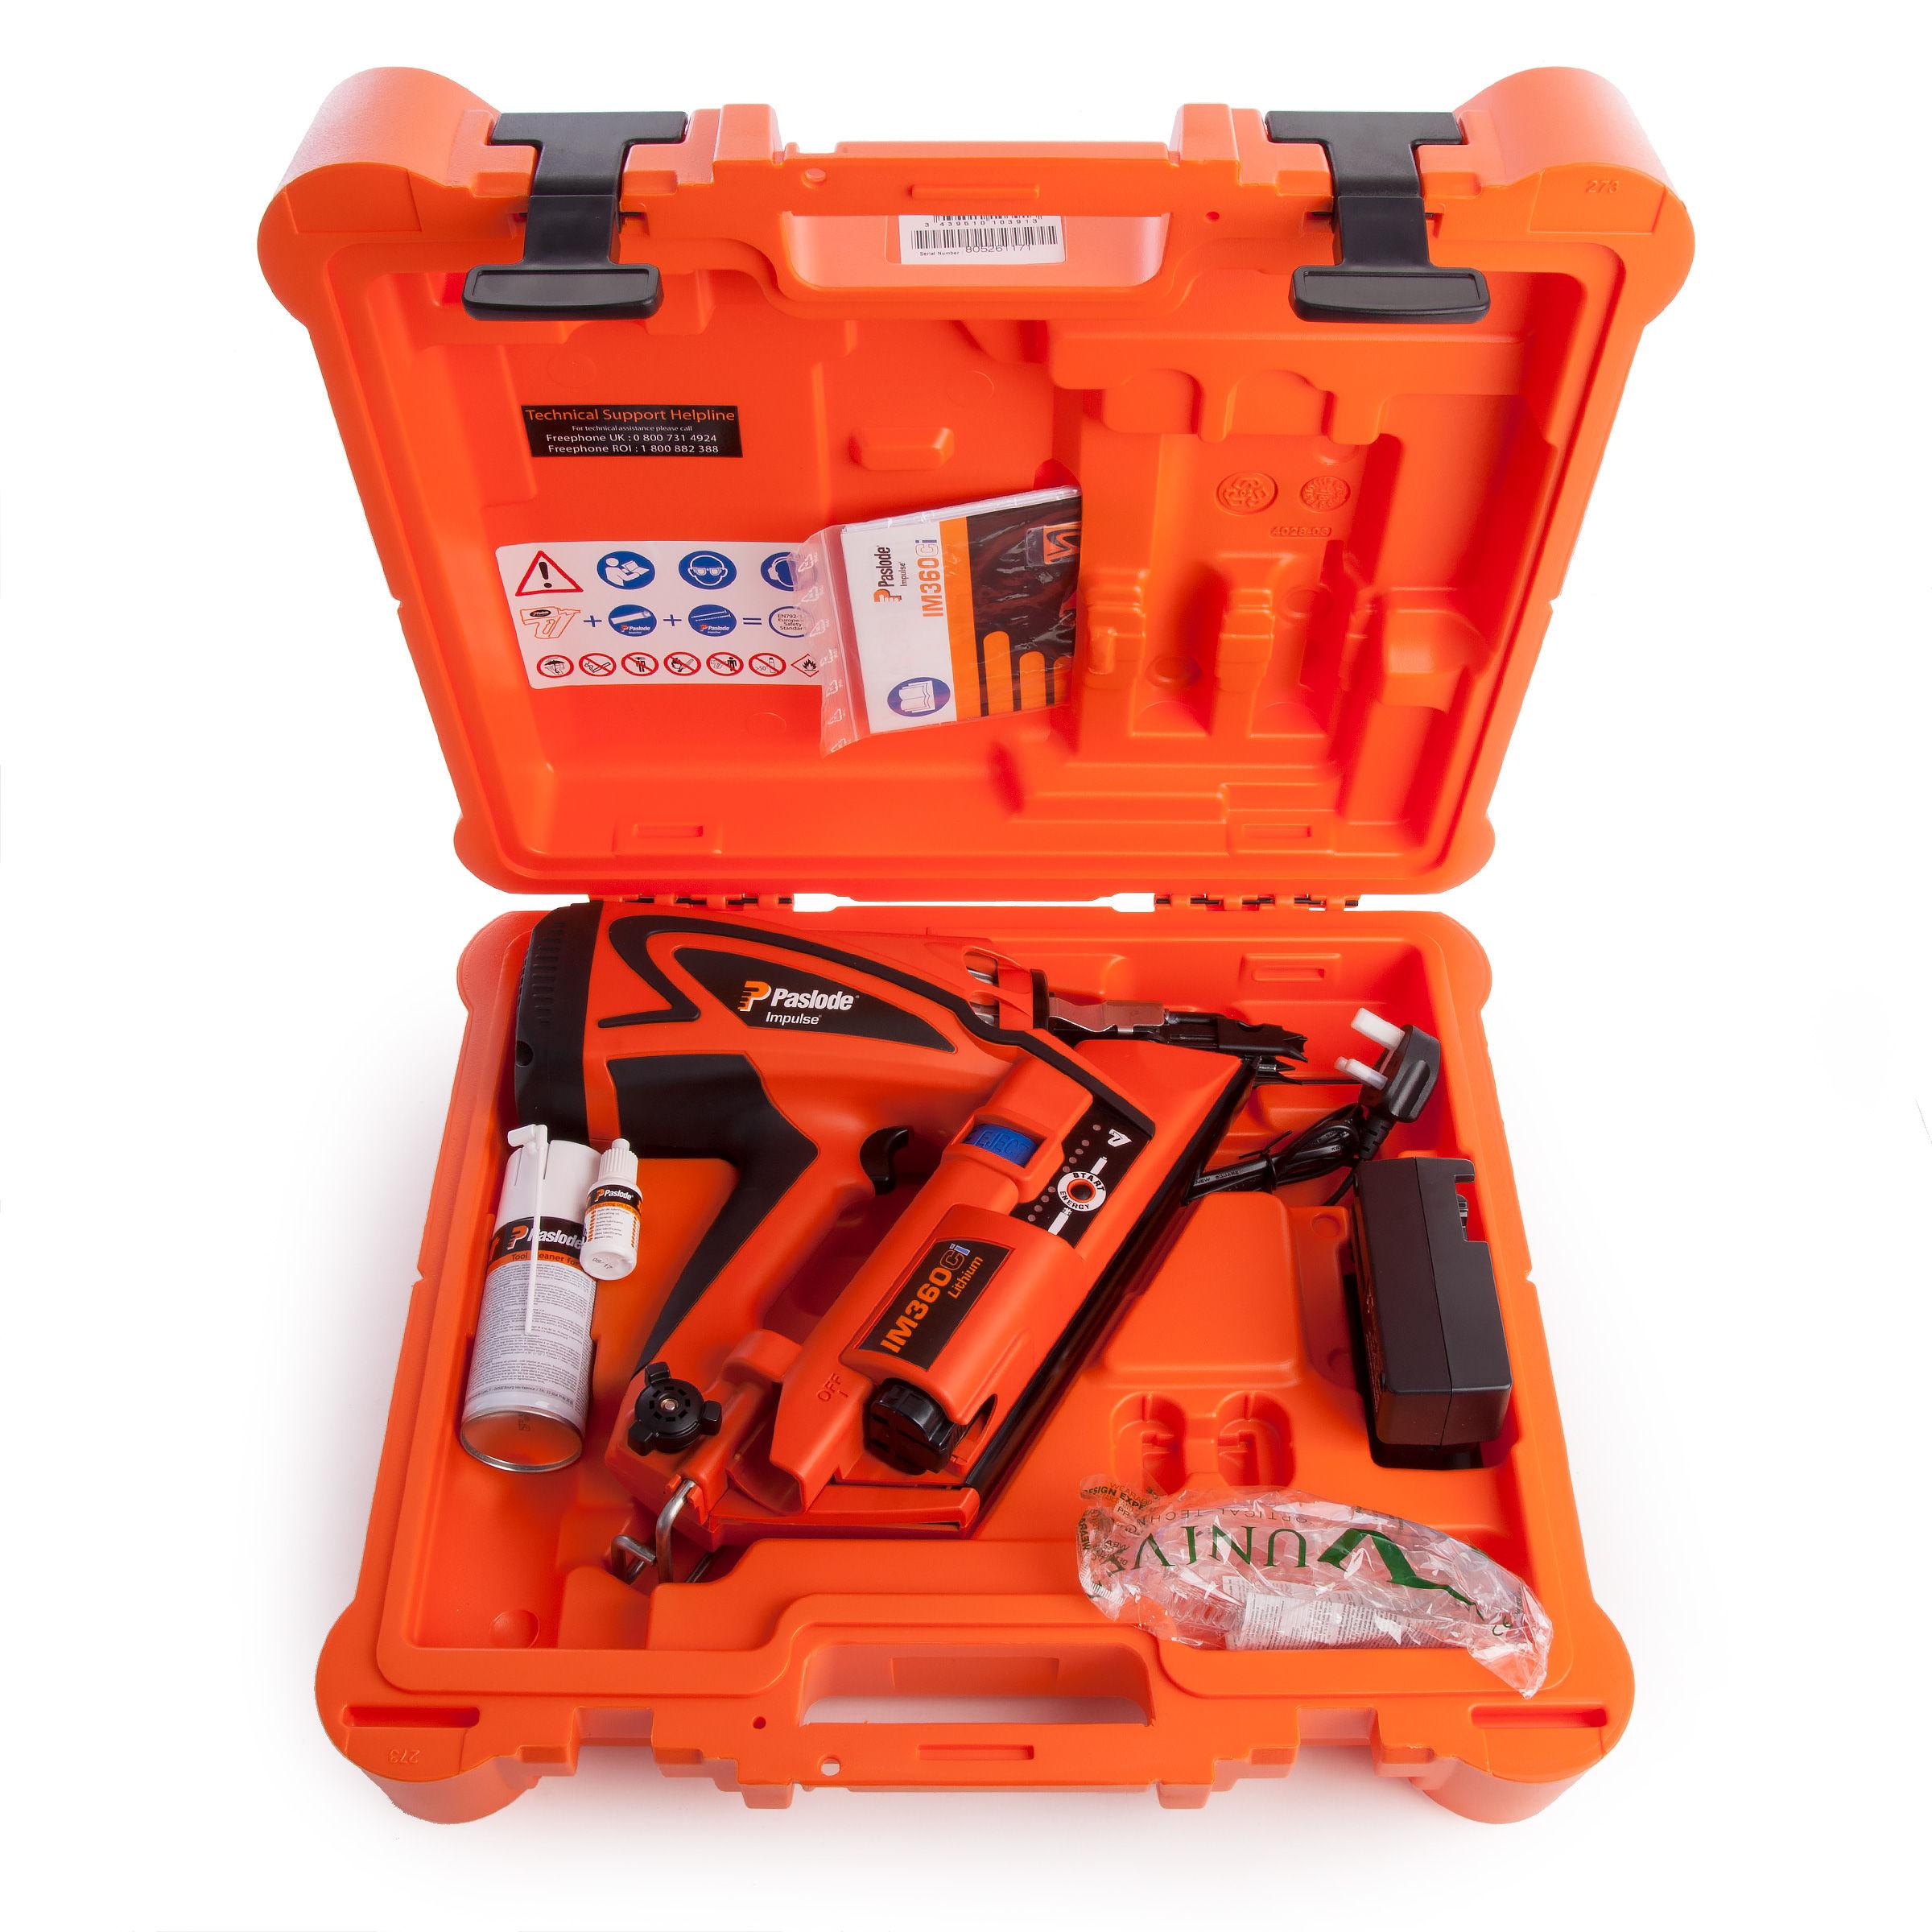 Toolstop Paslode Im360ci Cordless 7 2v 1st Fix Gas Framing